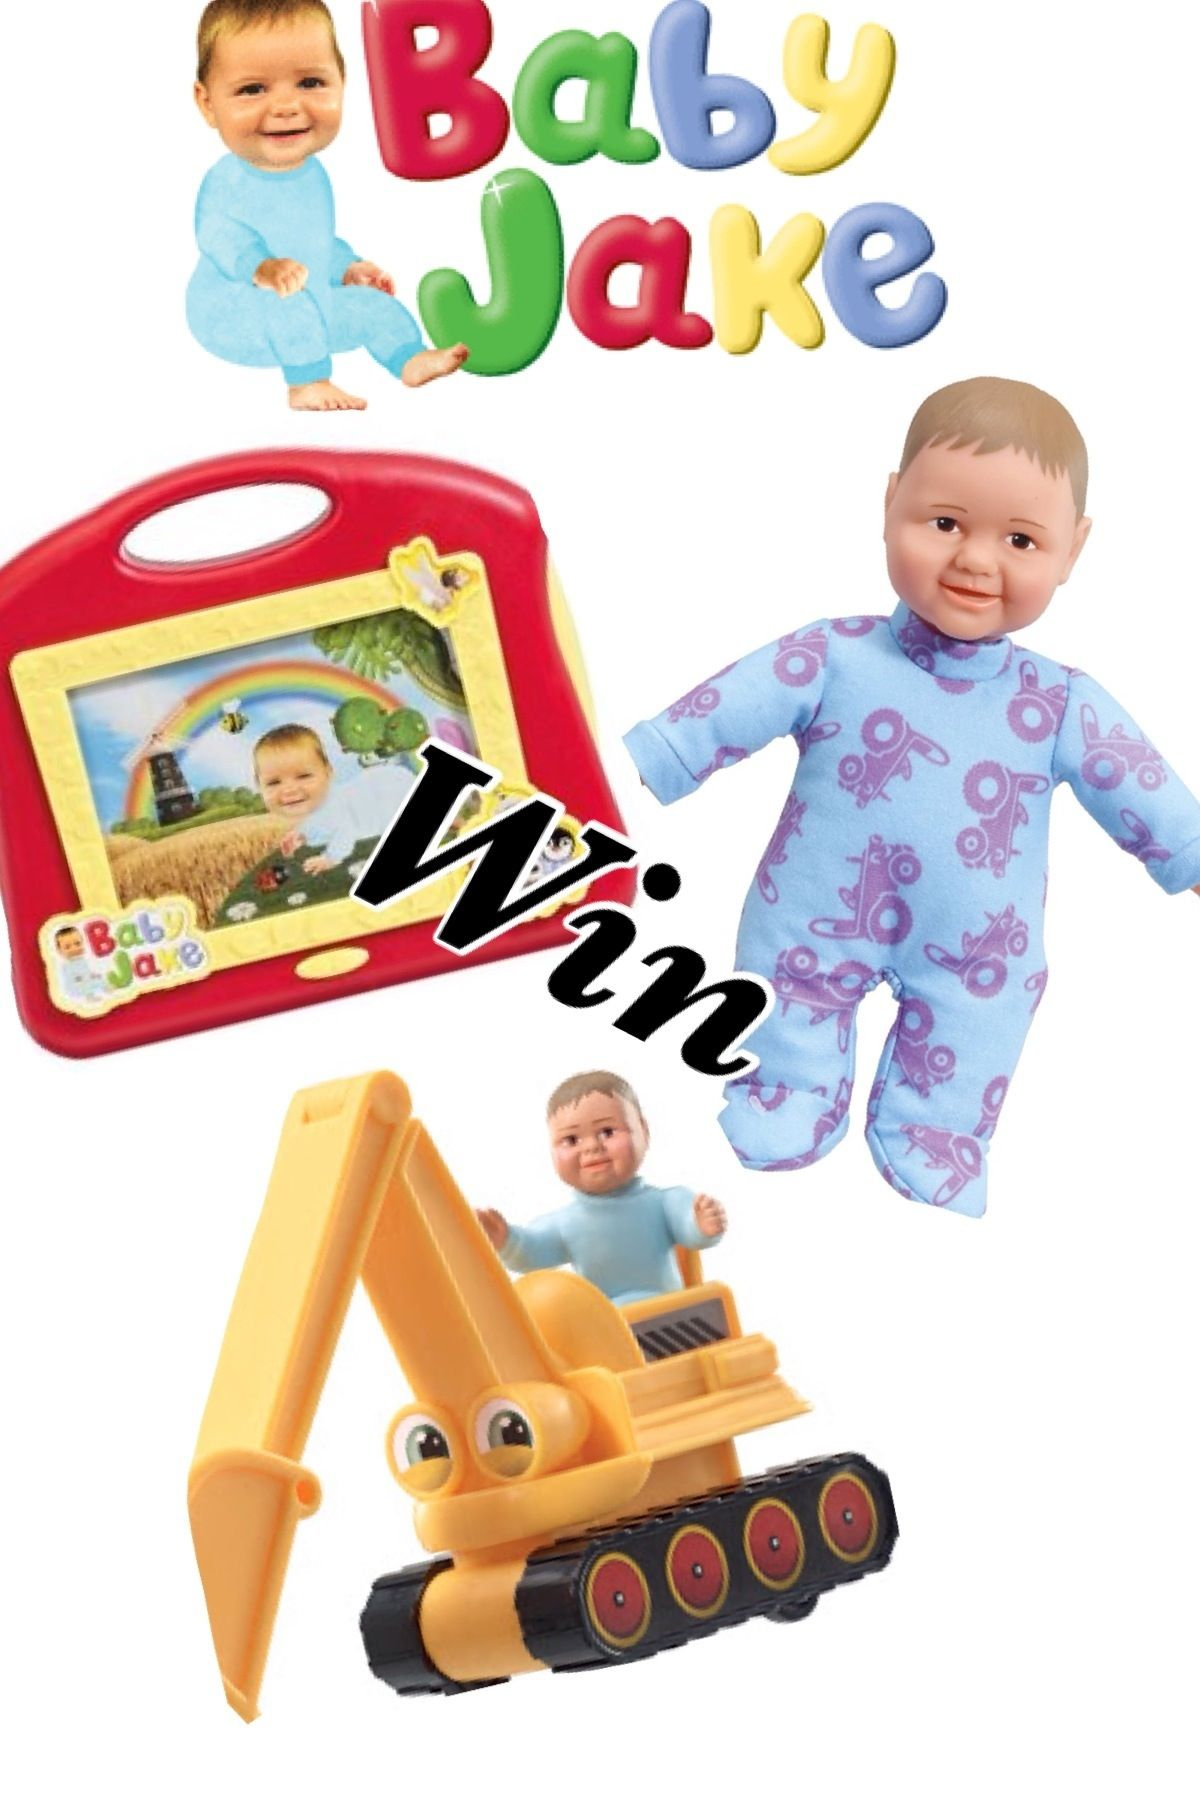 http://aspergersinfo.wordpress.com/2013/02/27/win-a-set-of-baby-jake-toys/#